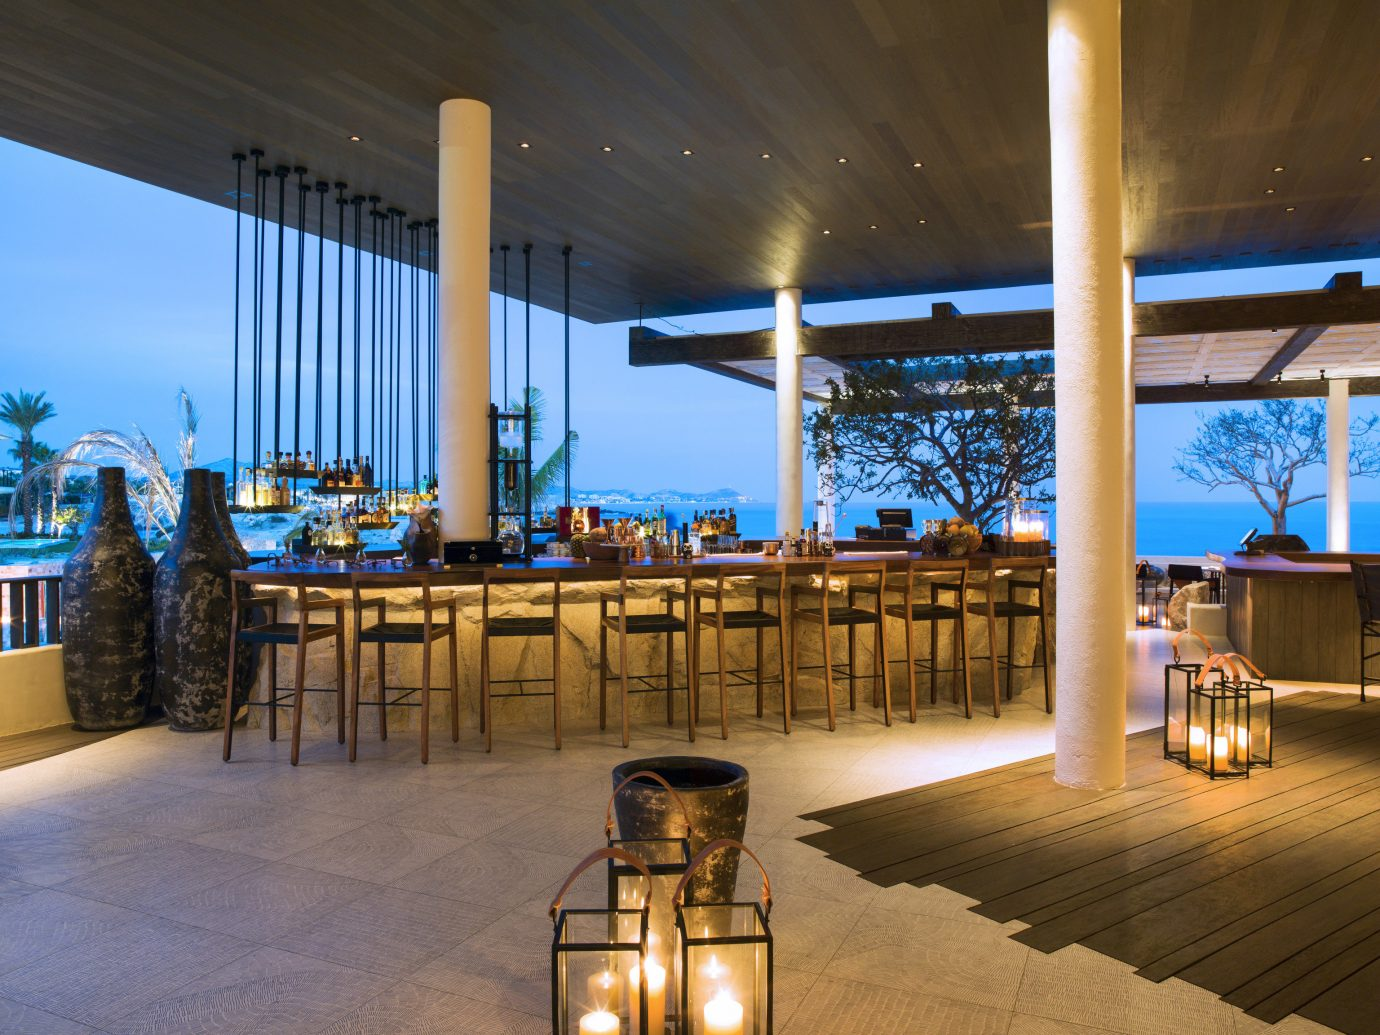 Hotels indoor ceiling Resort restaurant estate interior design convention center Design Lobby furniture area several